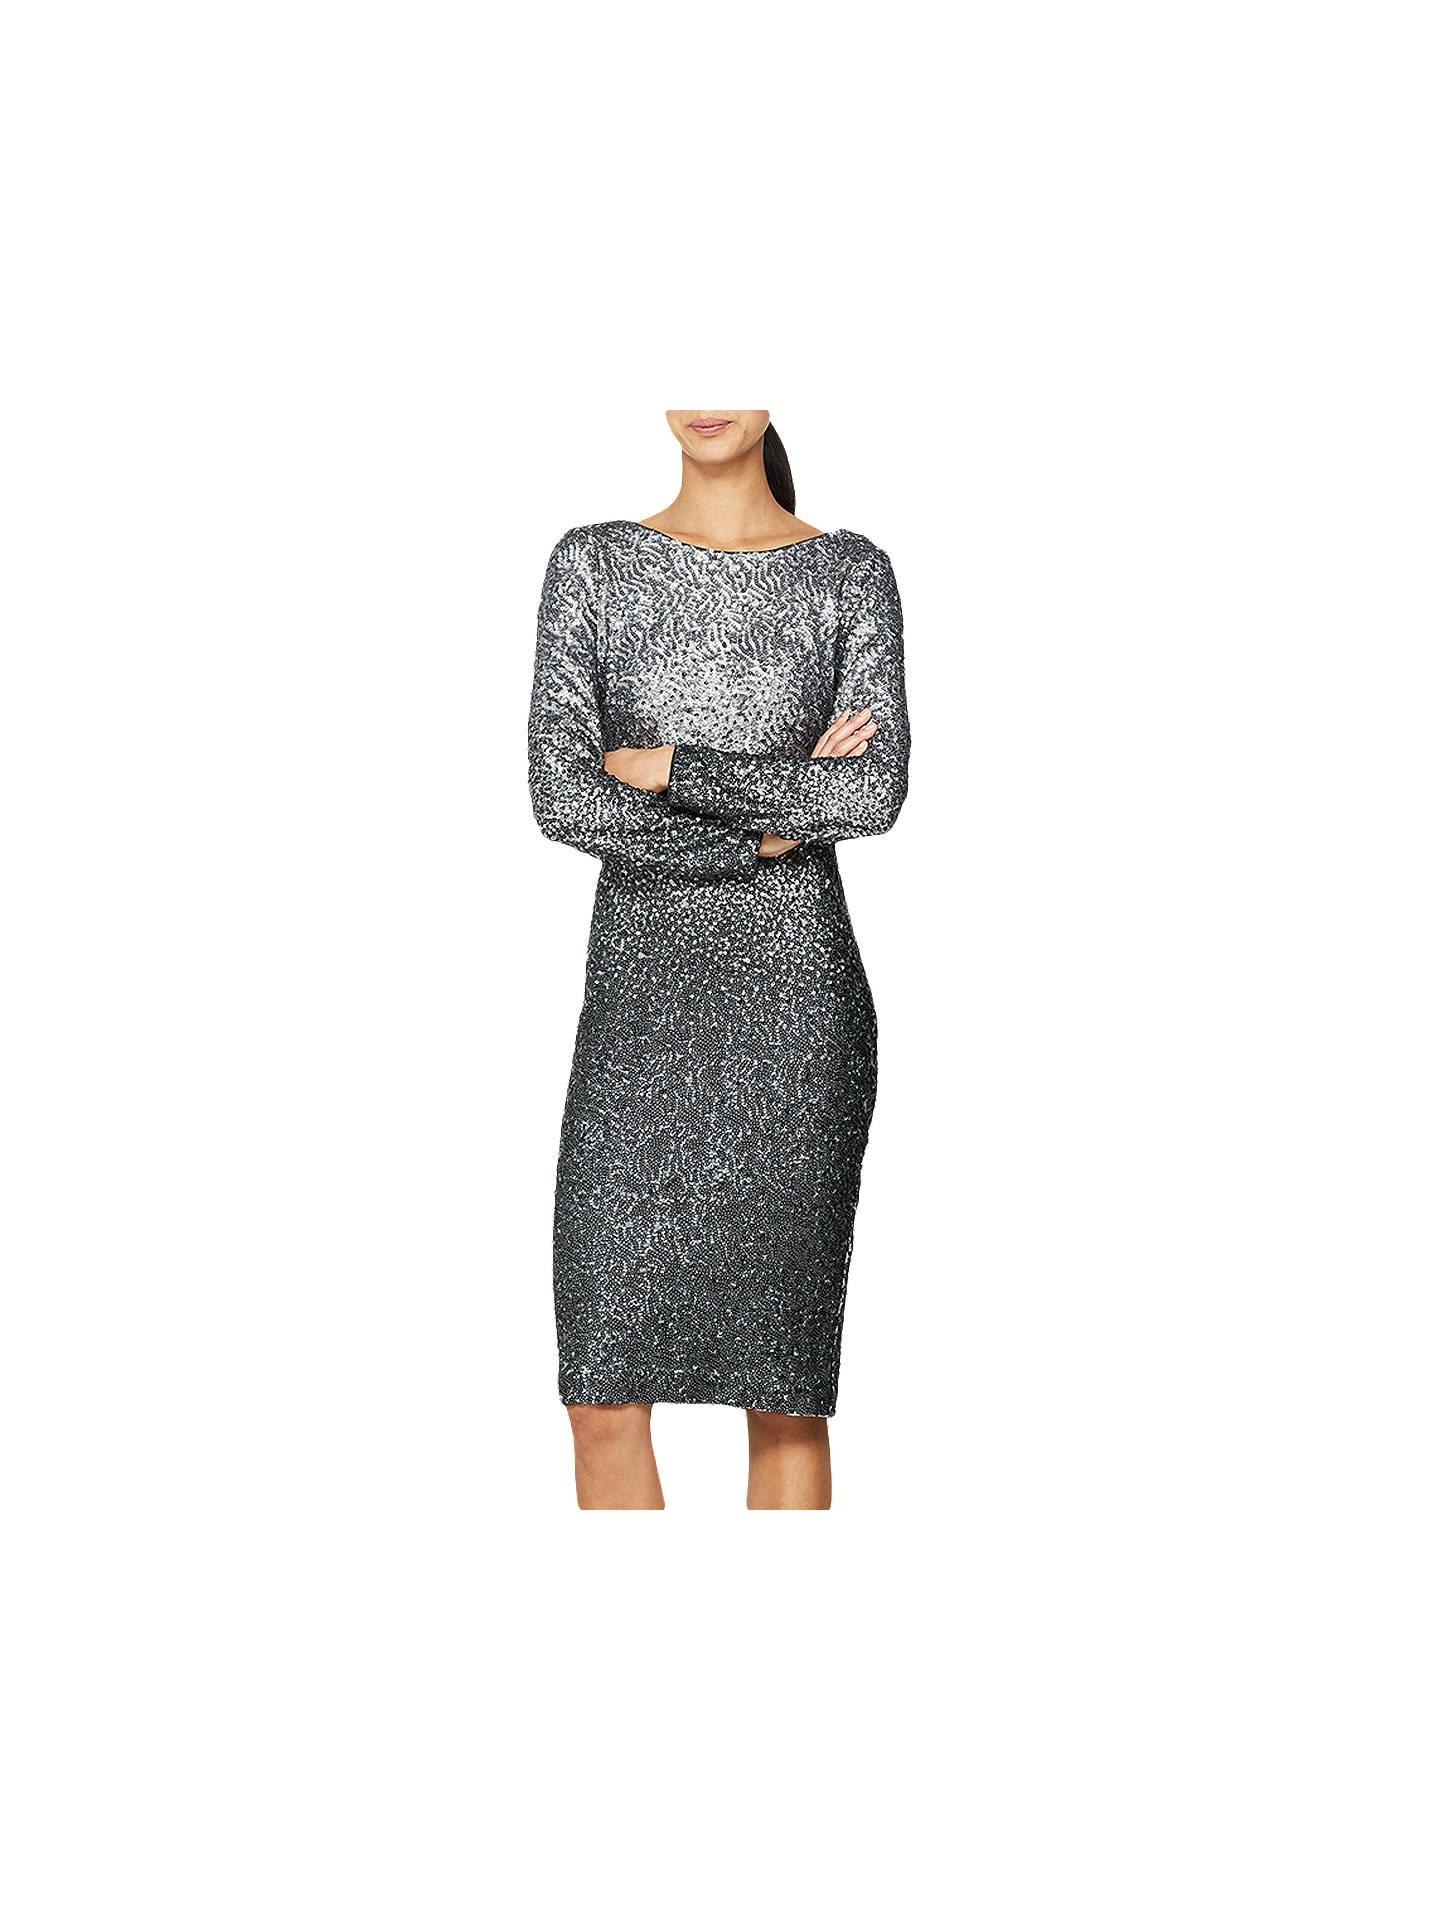 6df358d73c2 Buy Mint Velvet Ombre Sequin Midi Dress